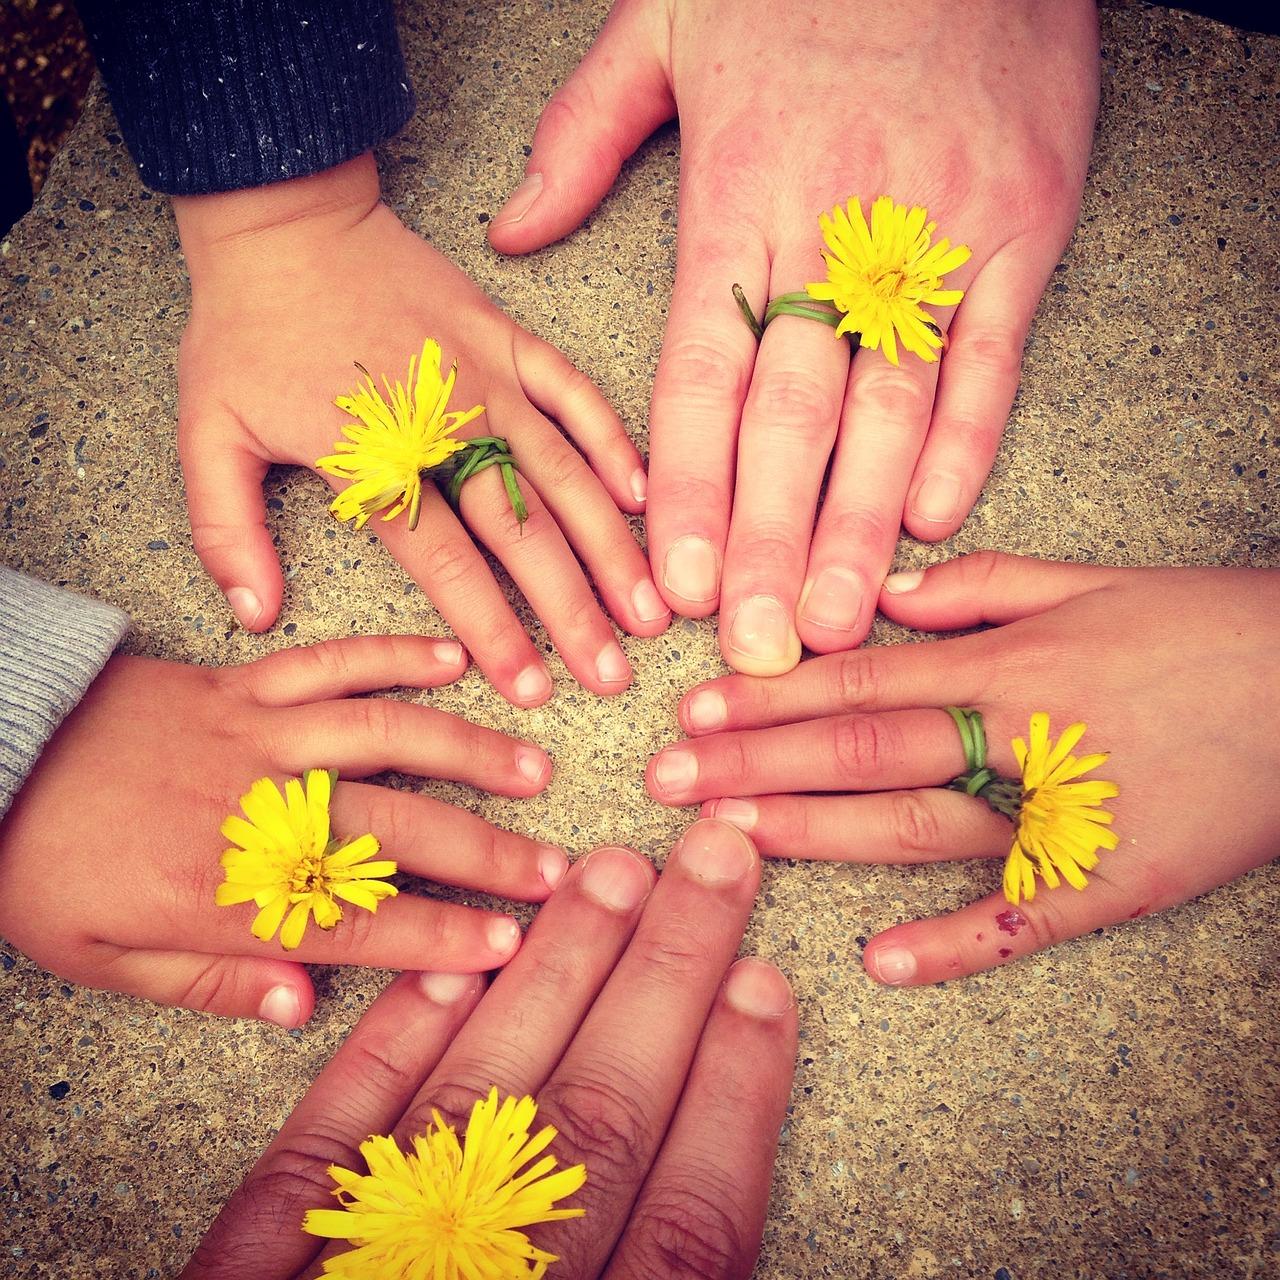 family-hand-1636615_1280